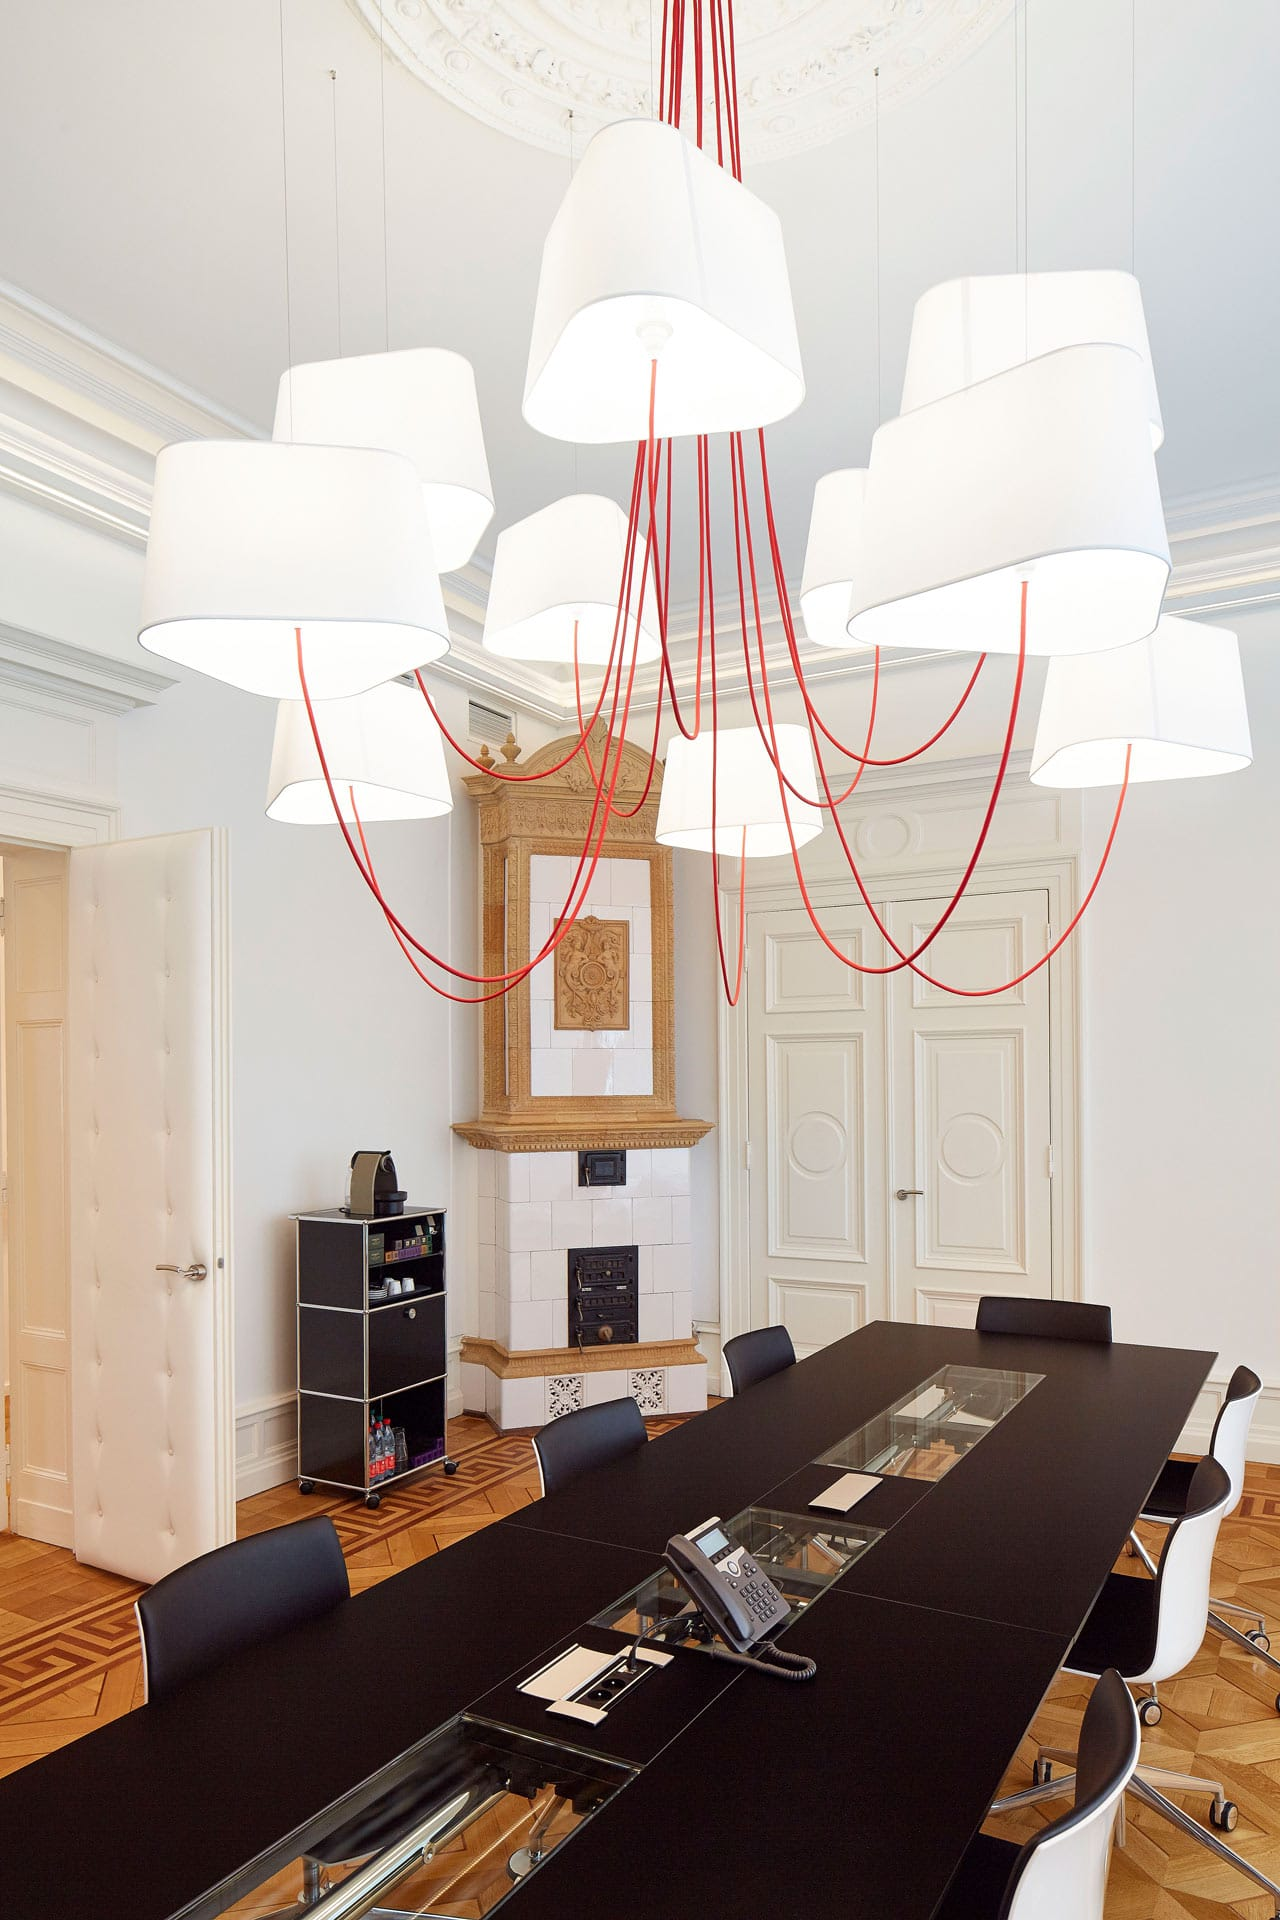 Cabinet Orion - Strasbourg